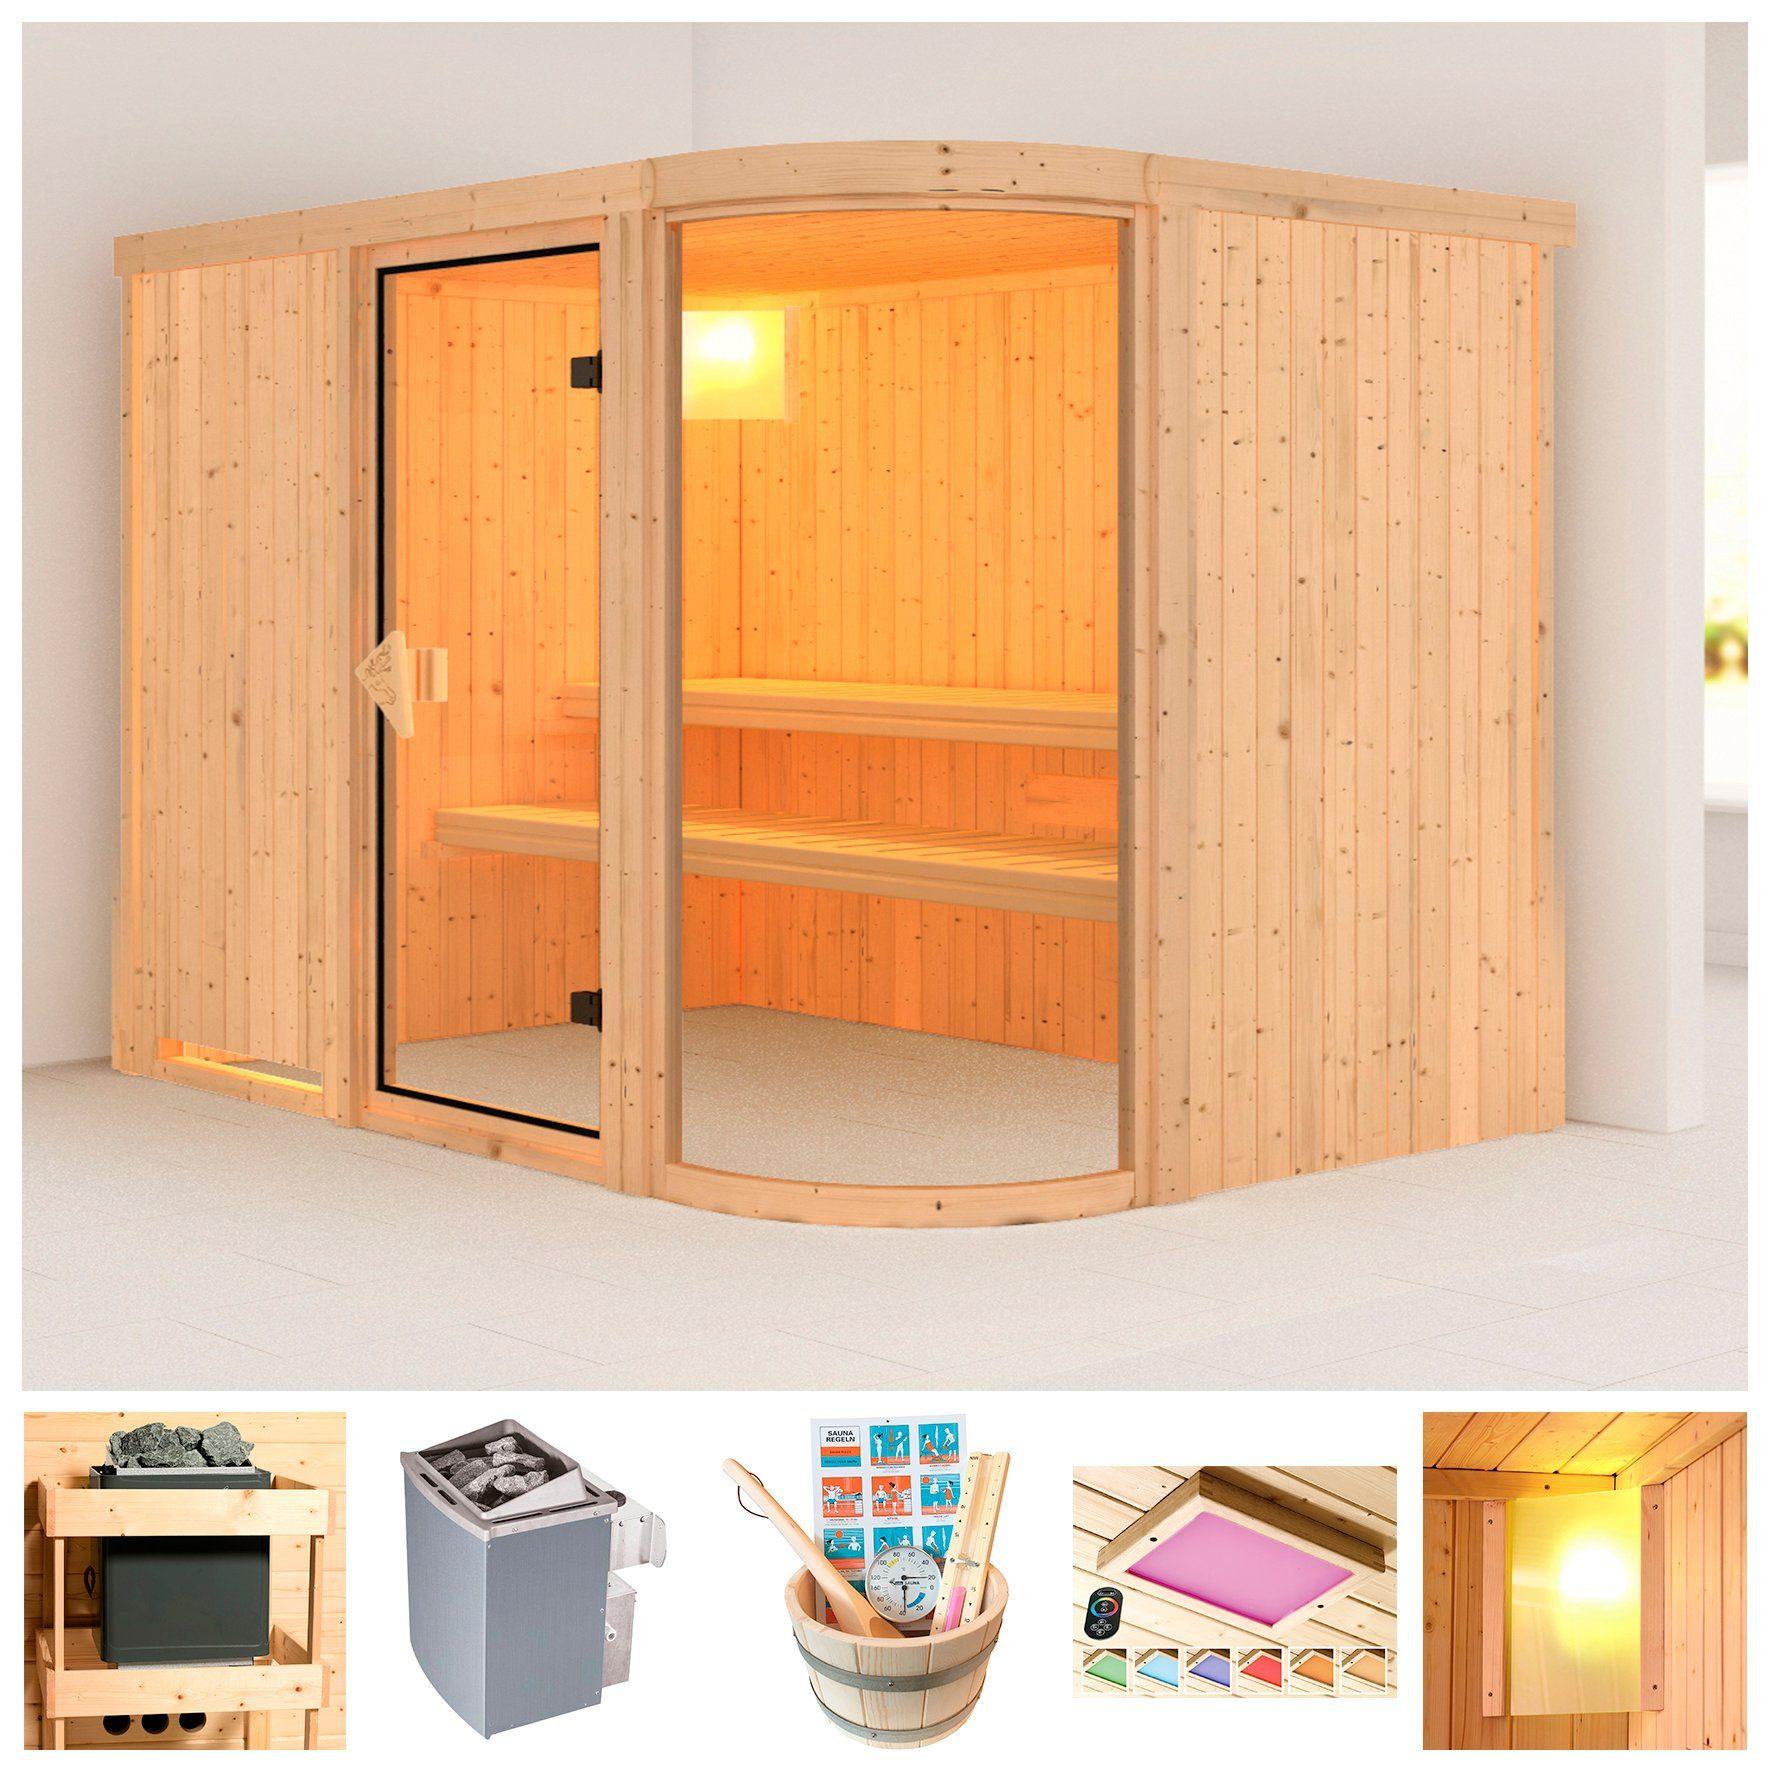 KONIFERA Sauna »Föhr«, BxTxH: 231x170x198 cm, 9 kW Ofen mit int. Steuerung